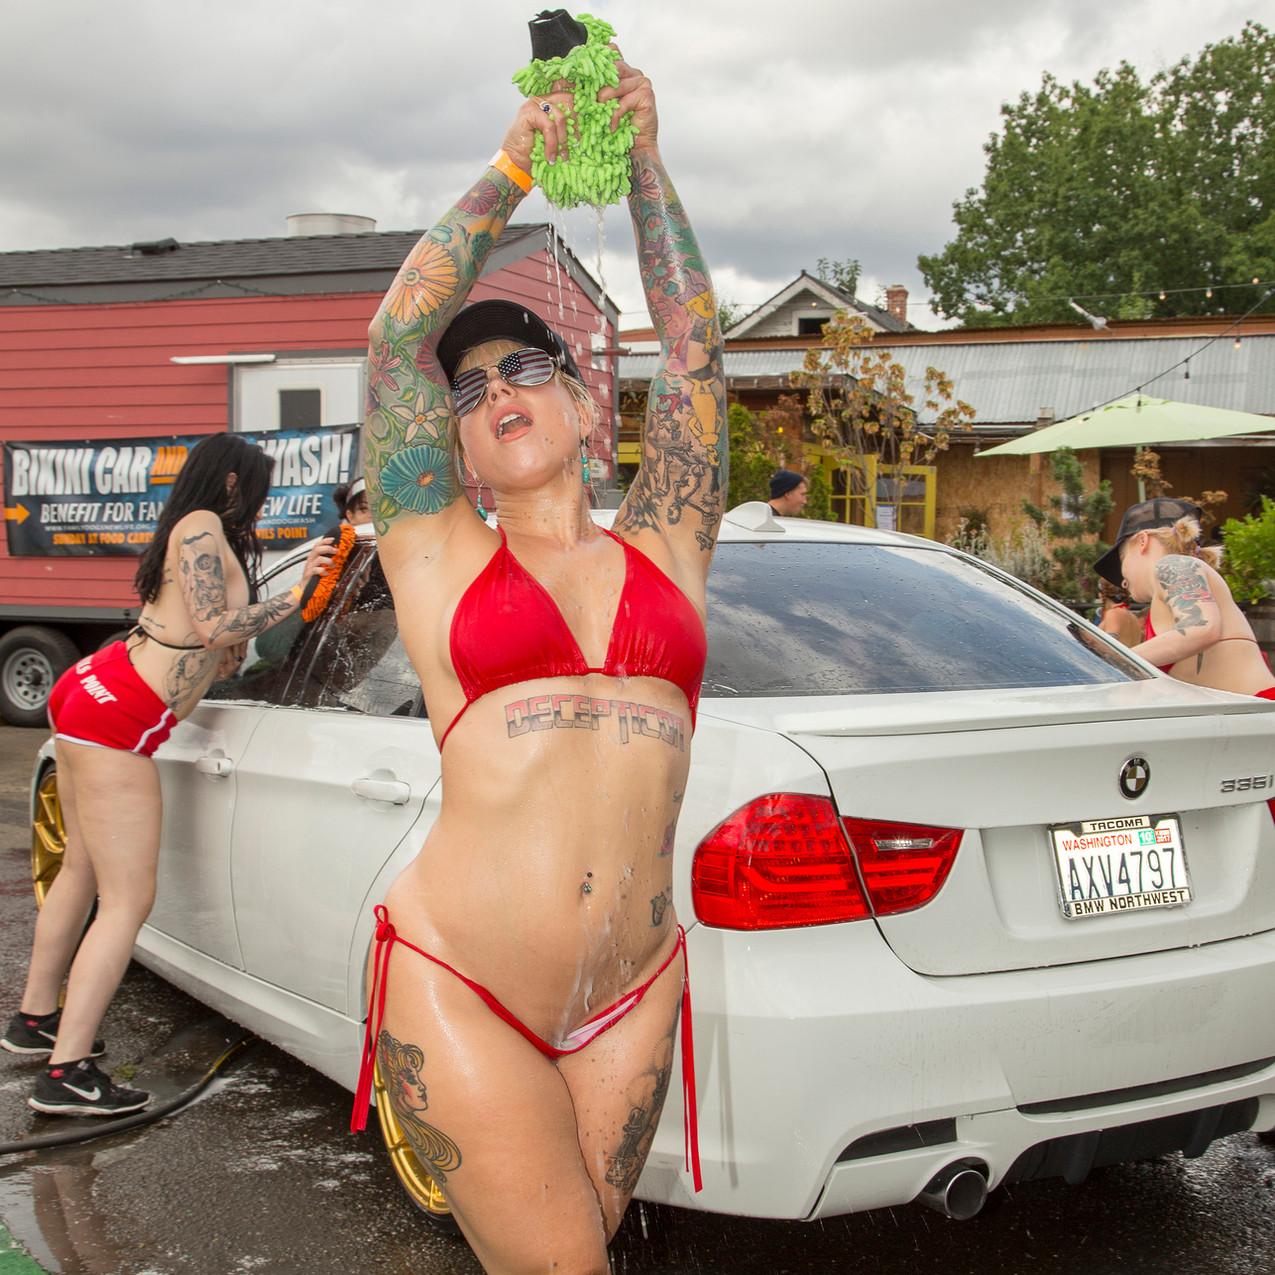 Car_Wash_2017-9